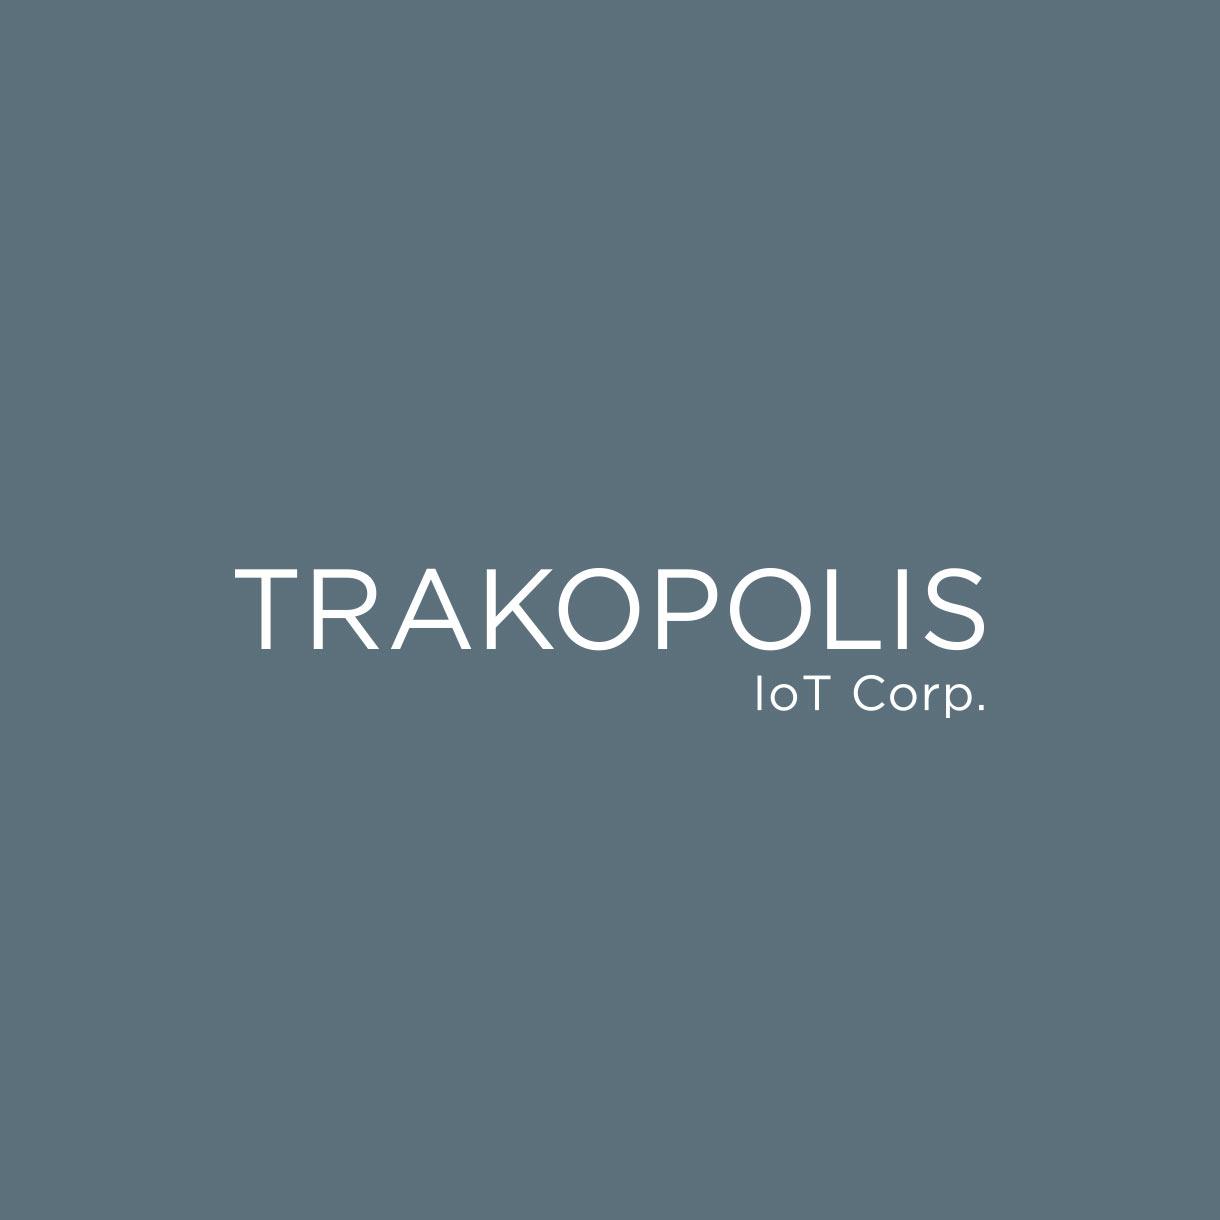 Trakopolis IoT Corp. Icon